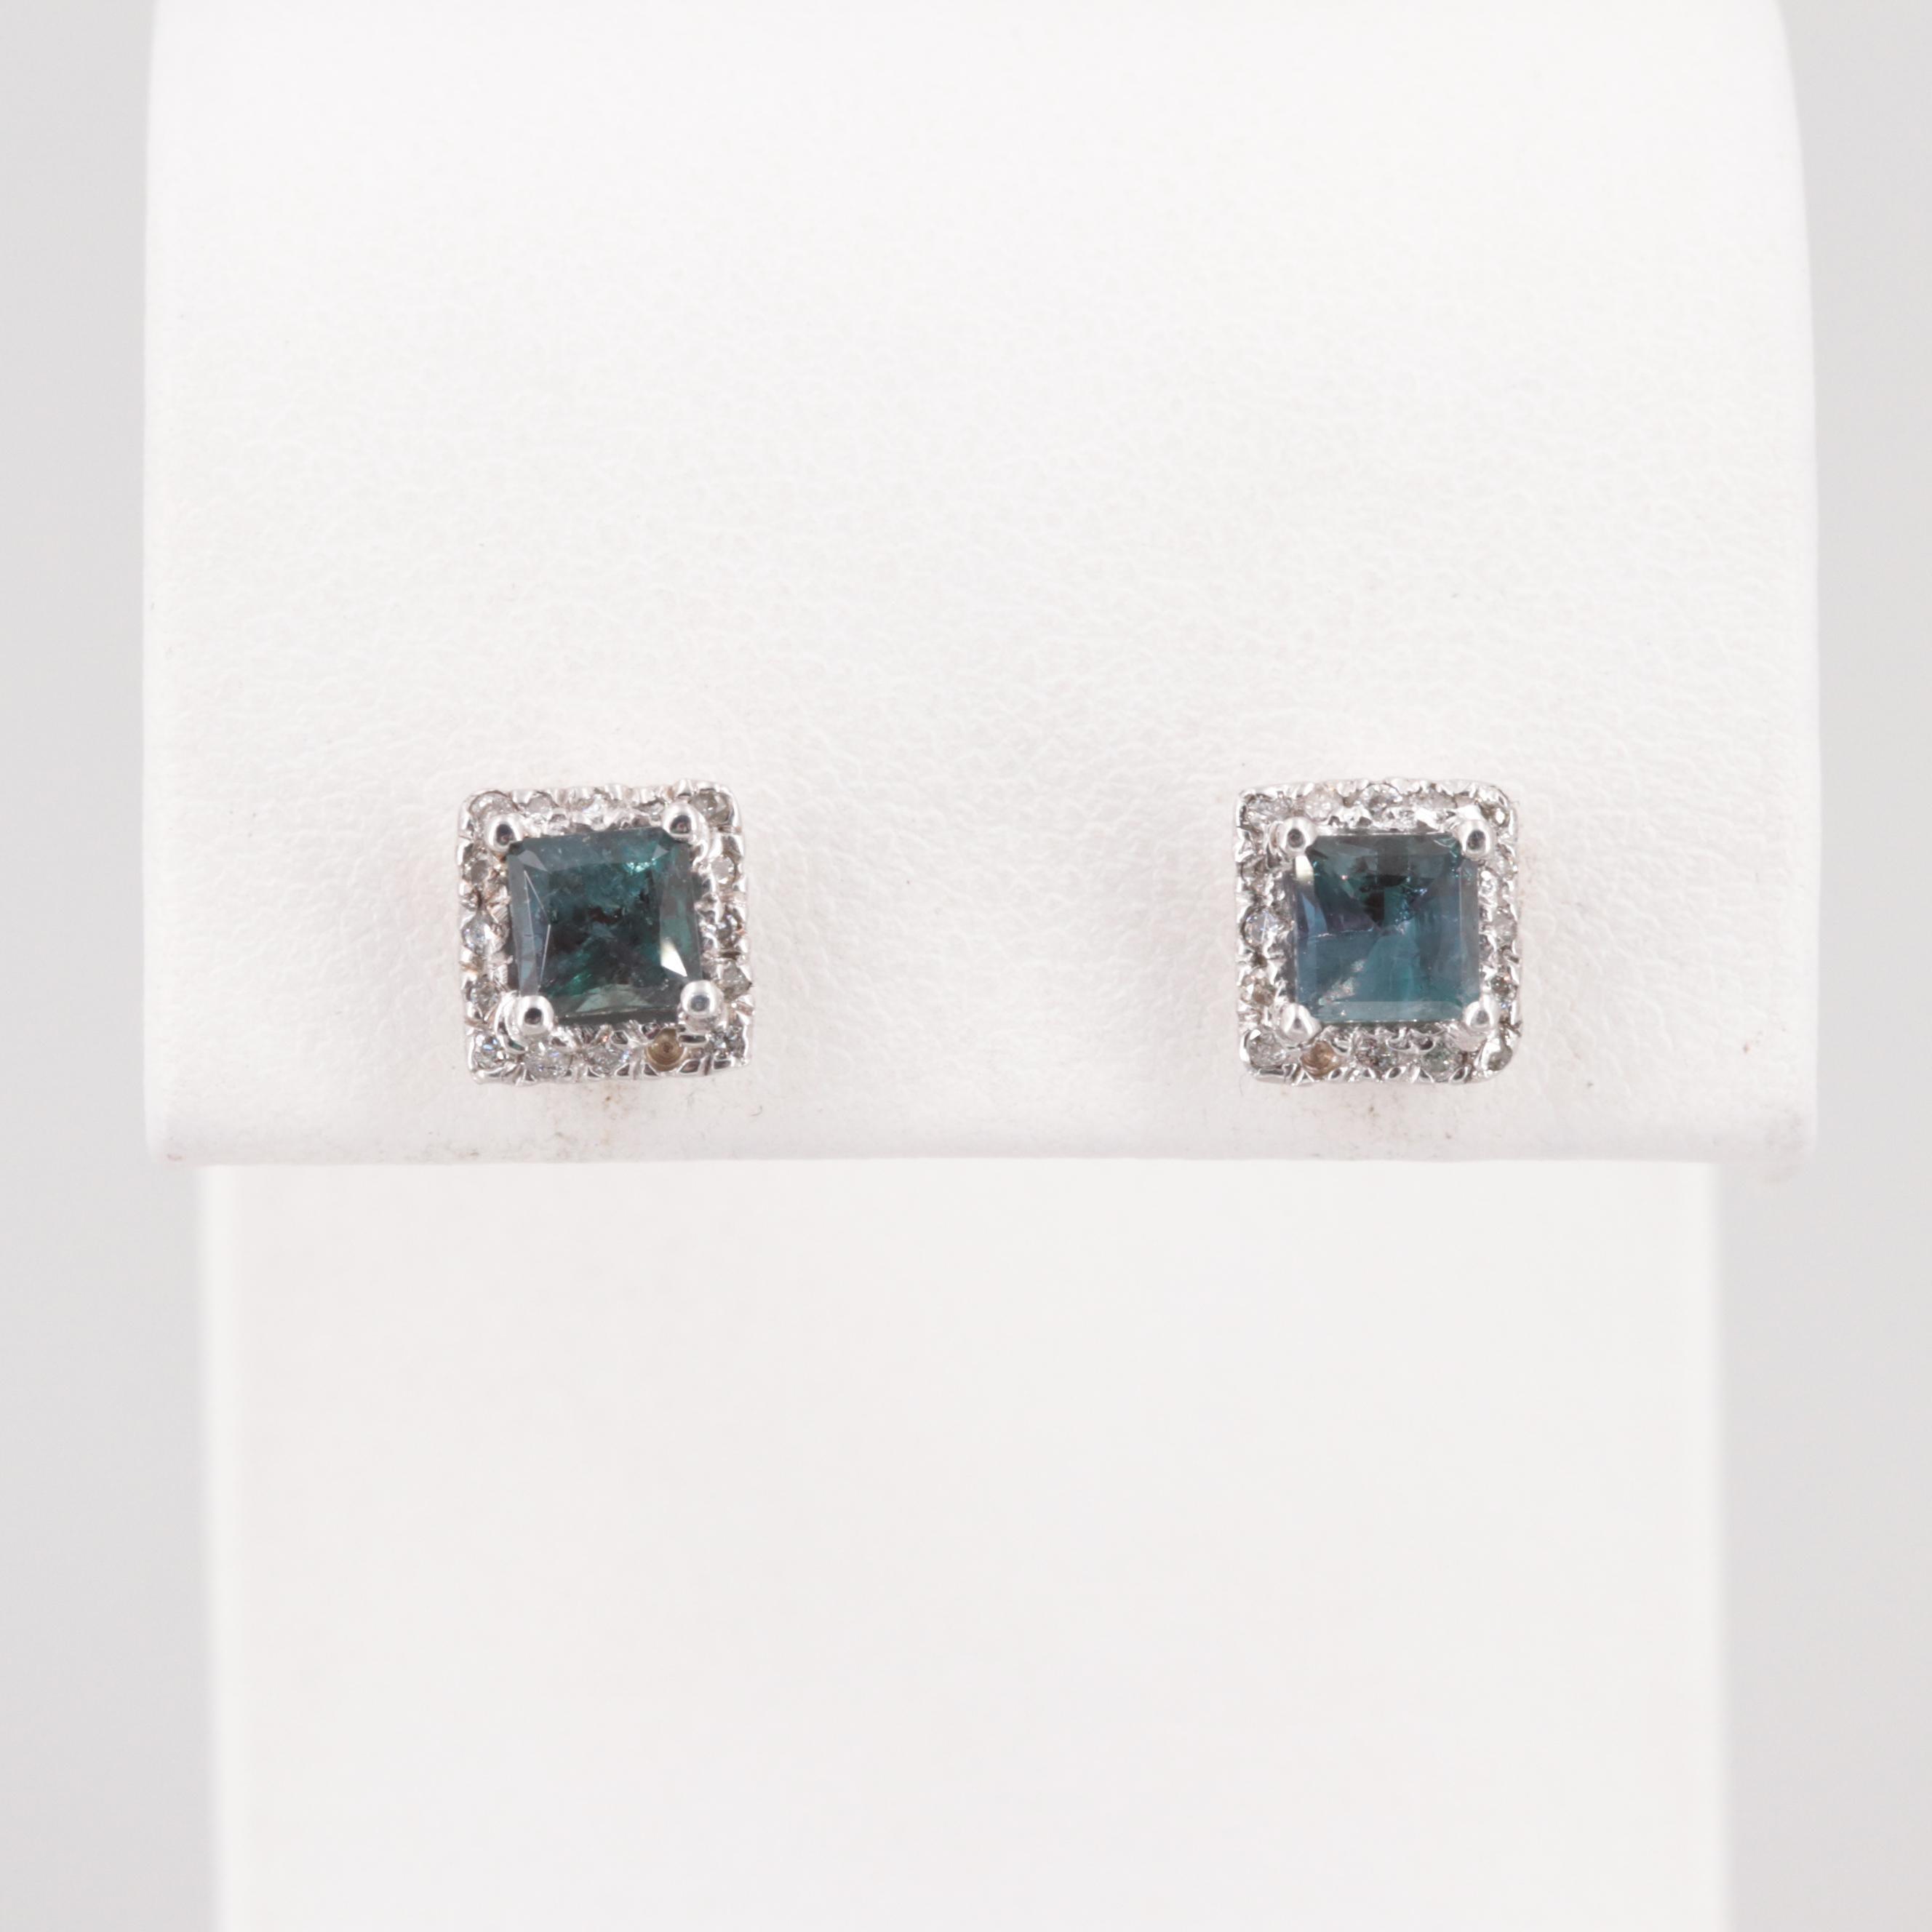 14K White Gold Color Change Alexandrite and Diamond Earrings